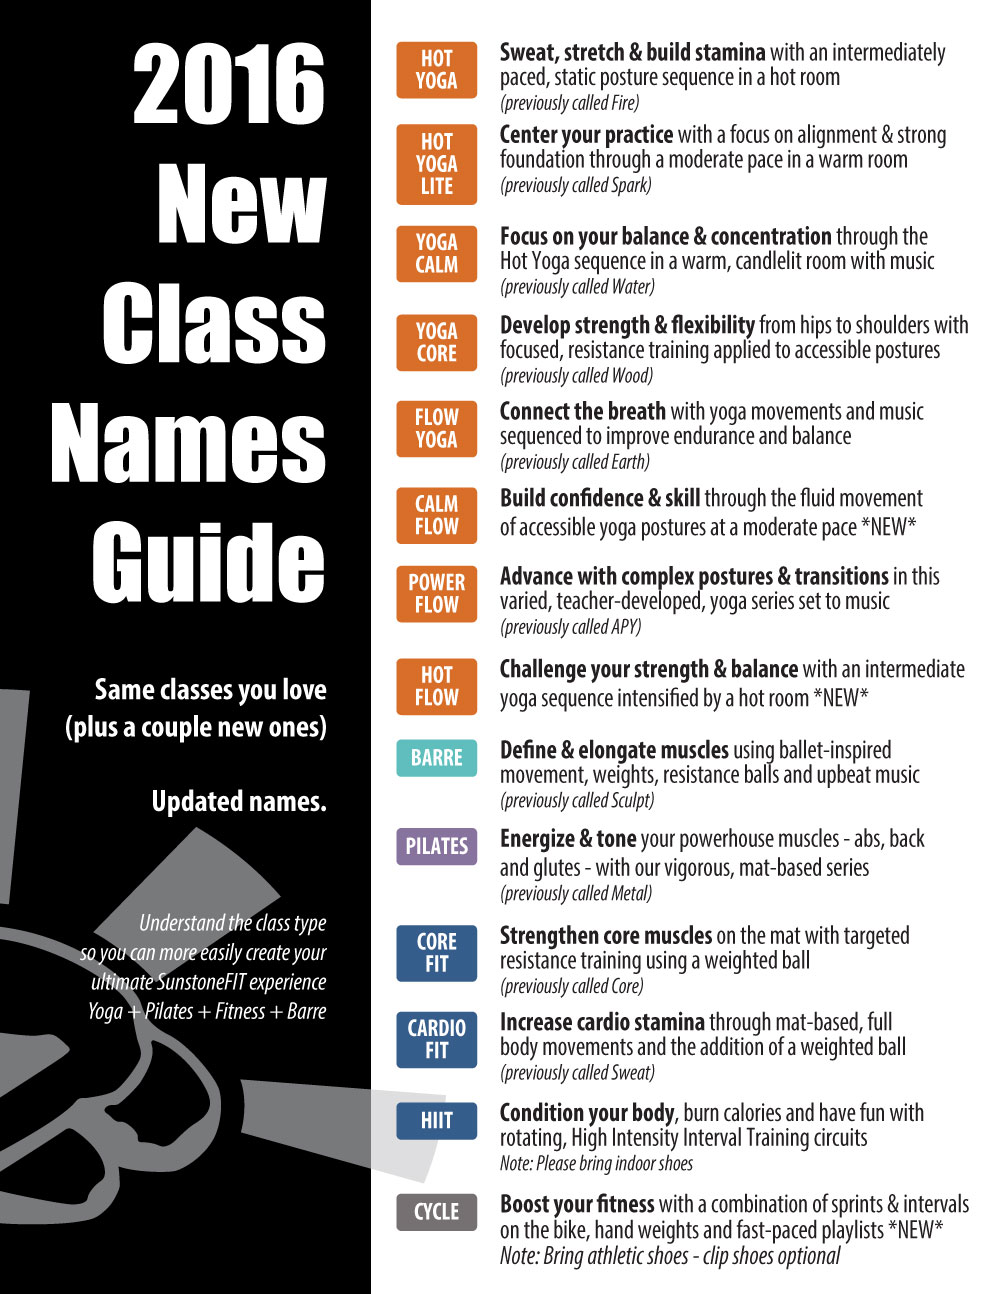 Dallas Hot Yoga, Pilates, Barre & Fitness | 2016 Class Names